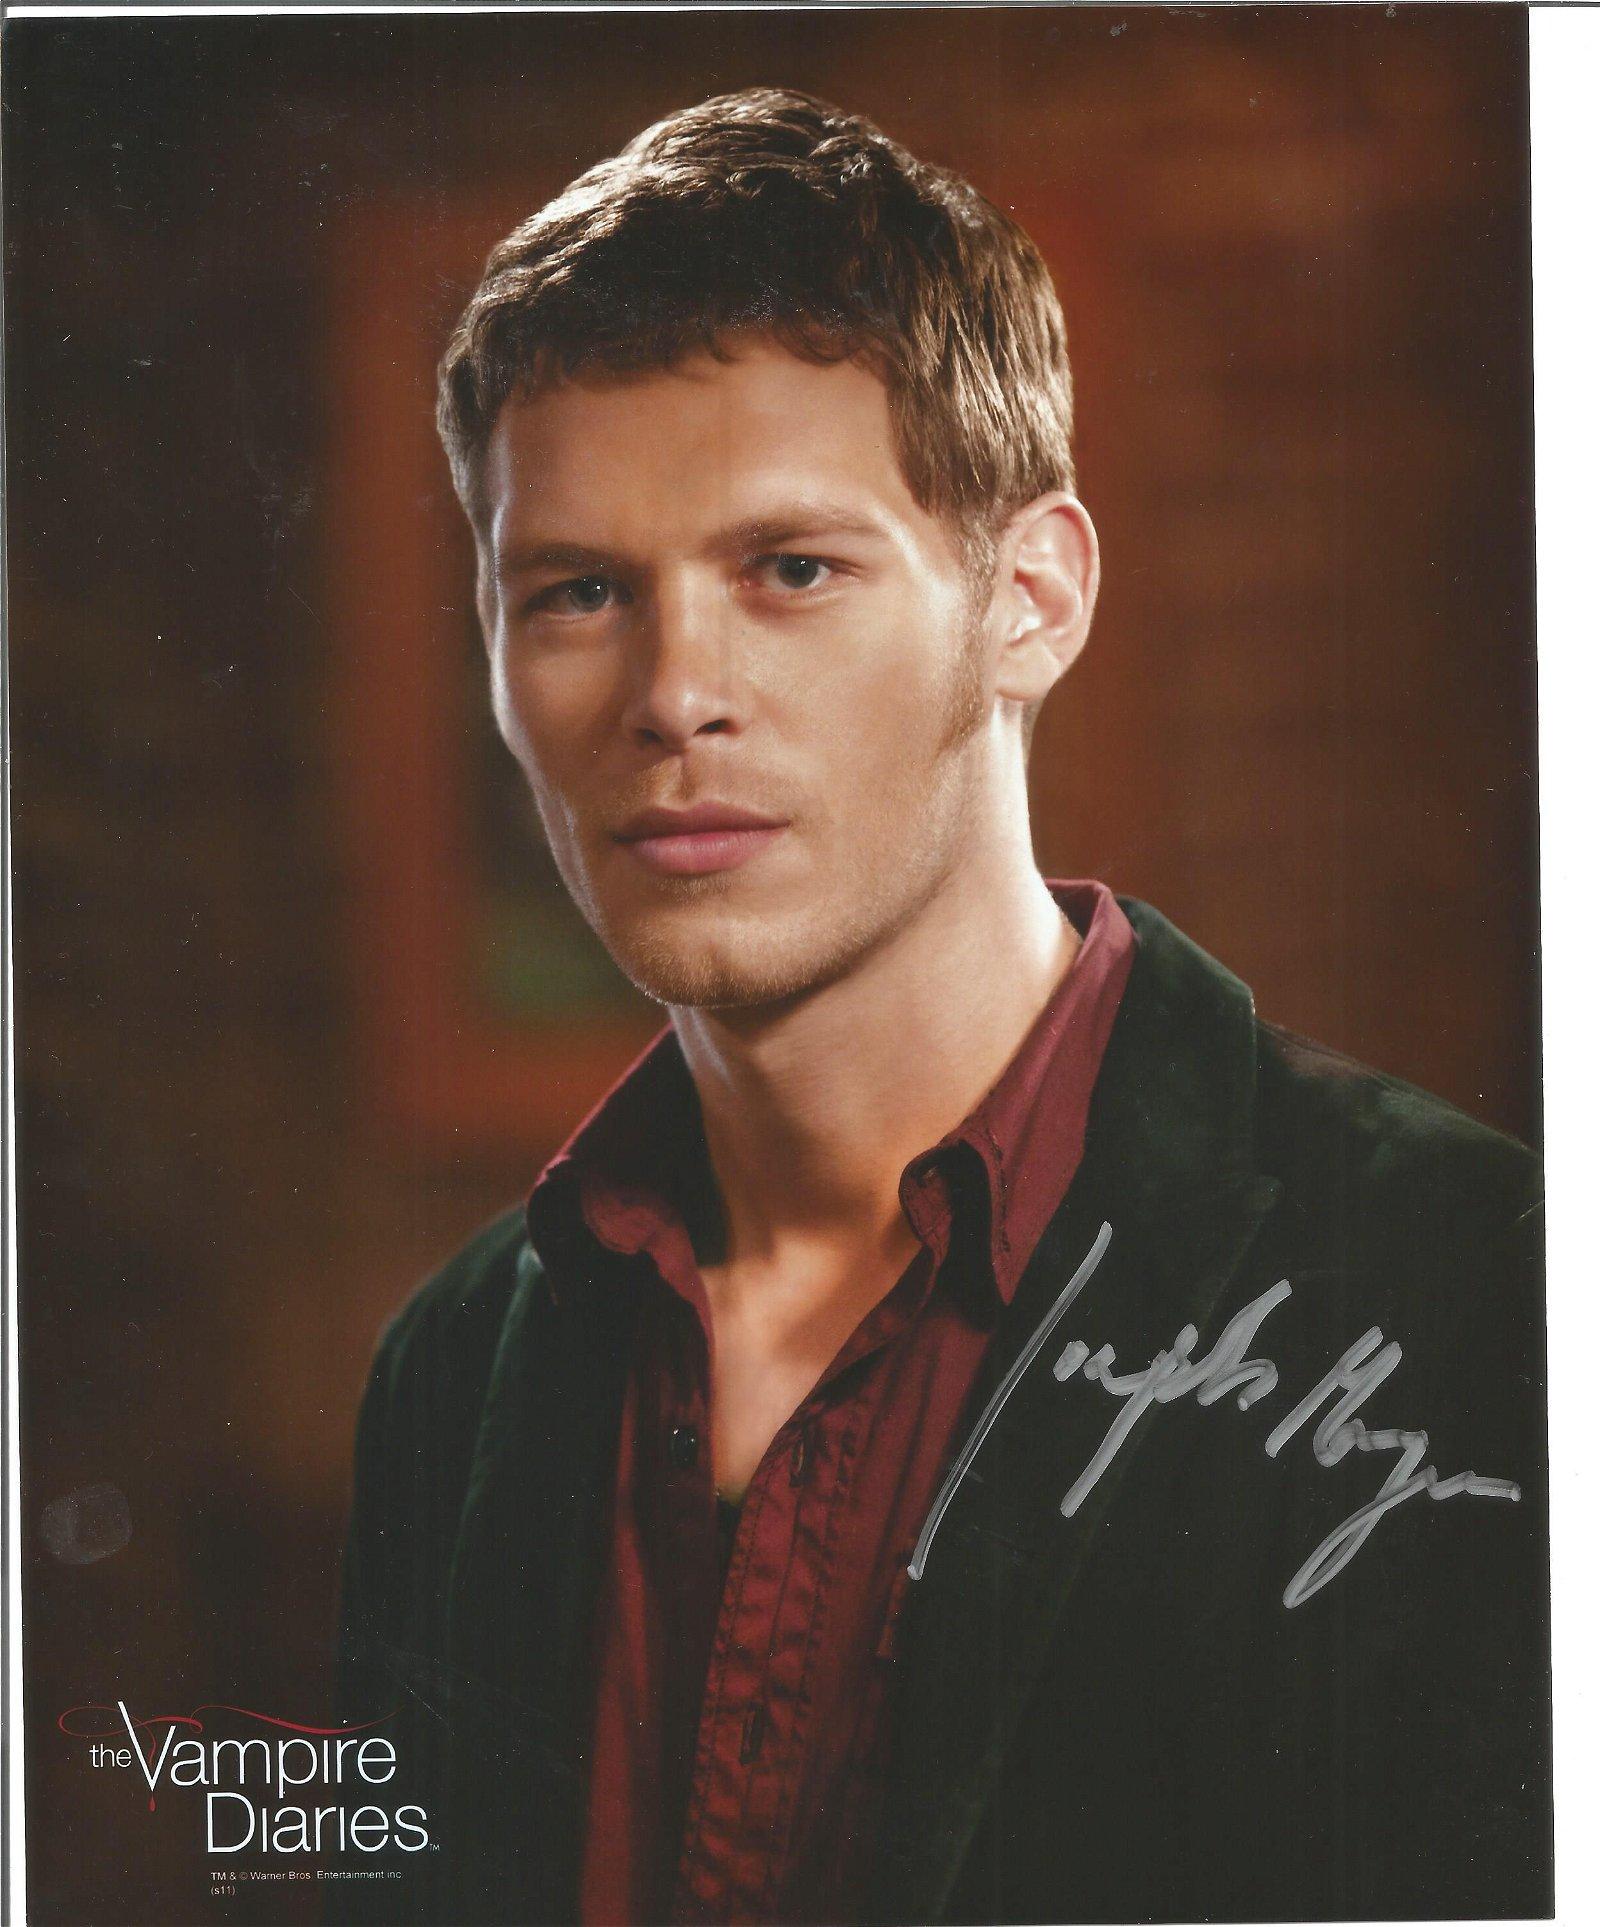 Joseph Morgan signed 10x8 colour photo from Vampire